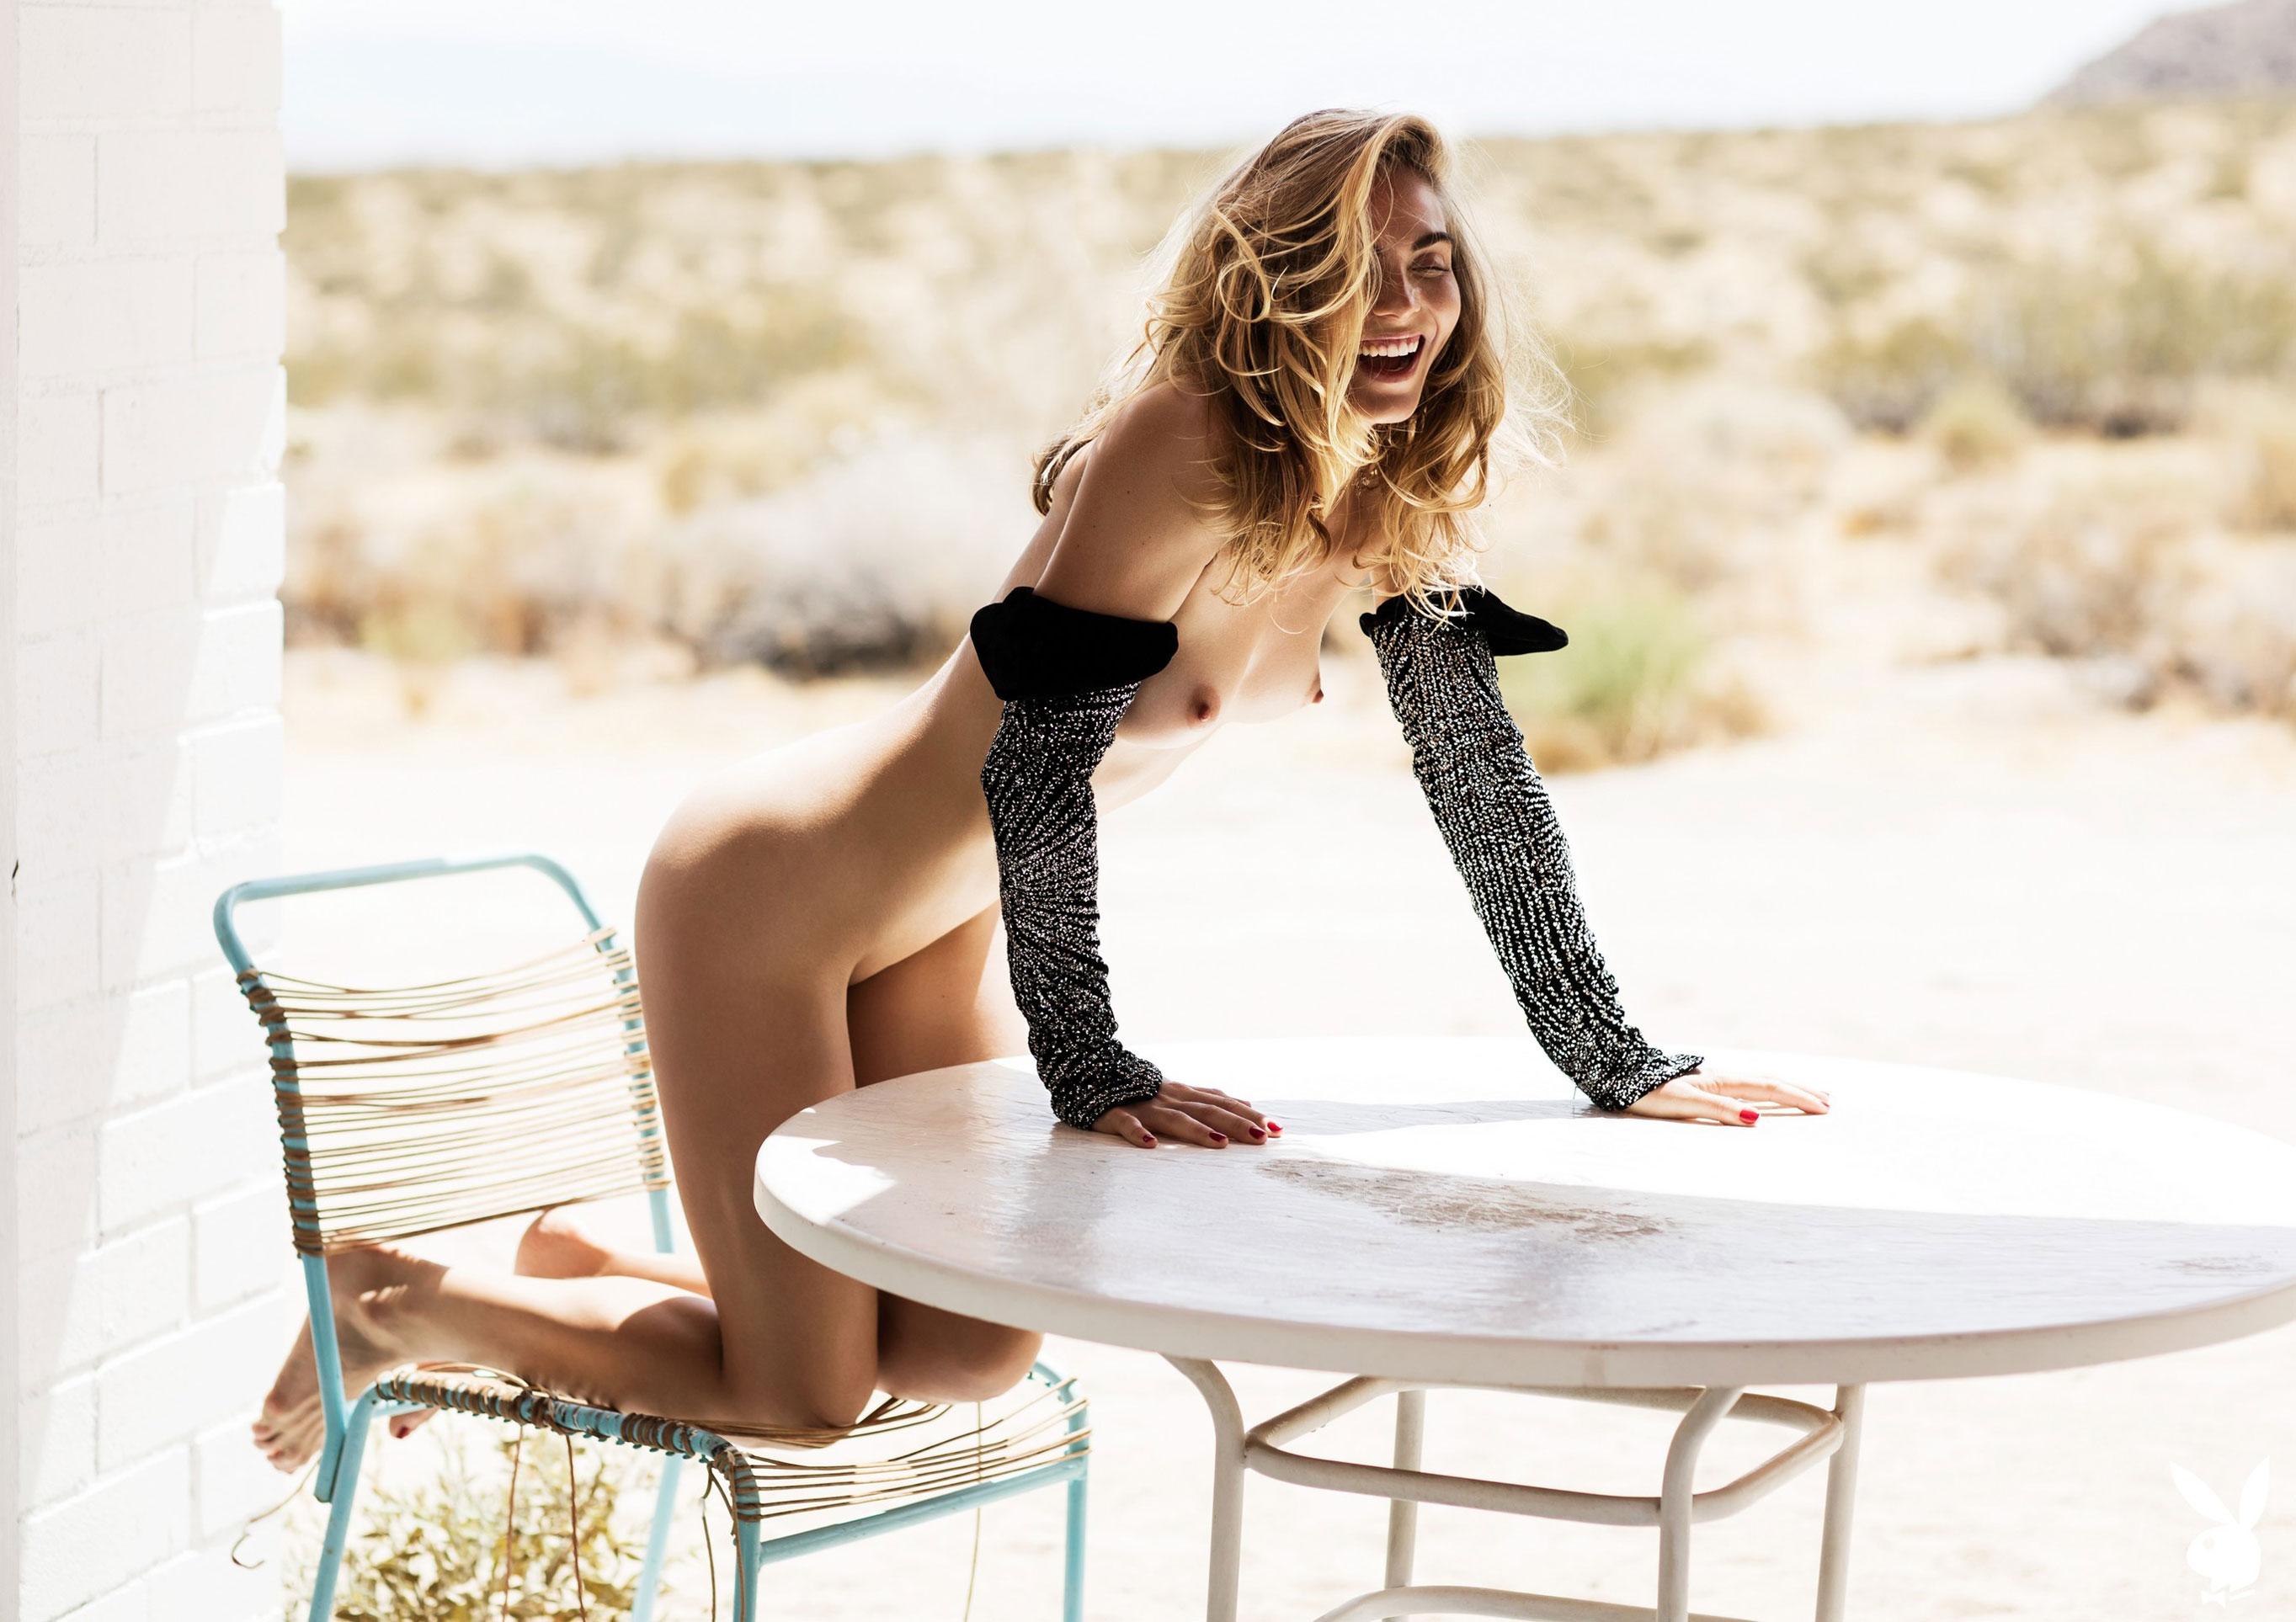 Девушка месяца Playboy USA Джорди Мюррэй / фото 18